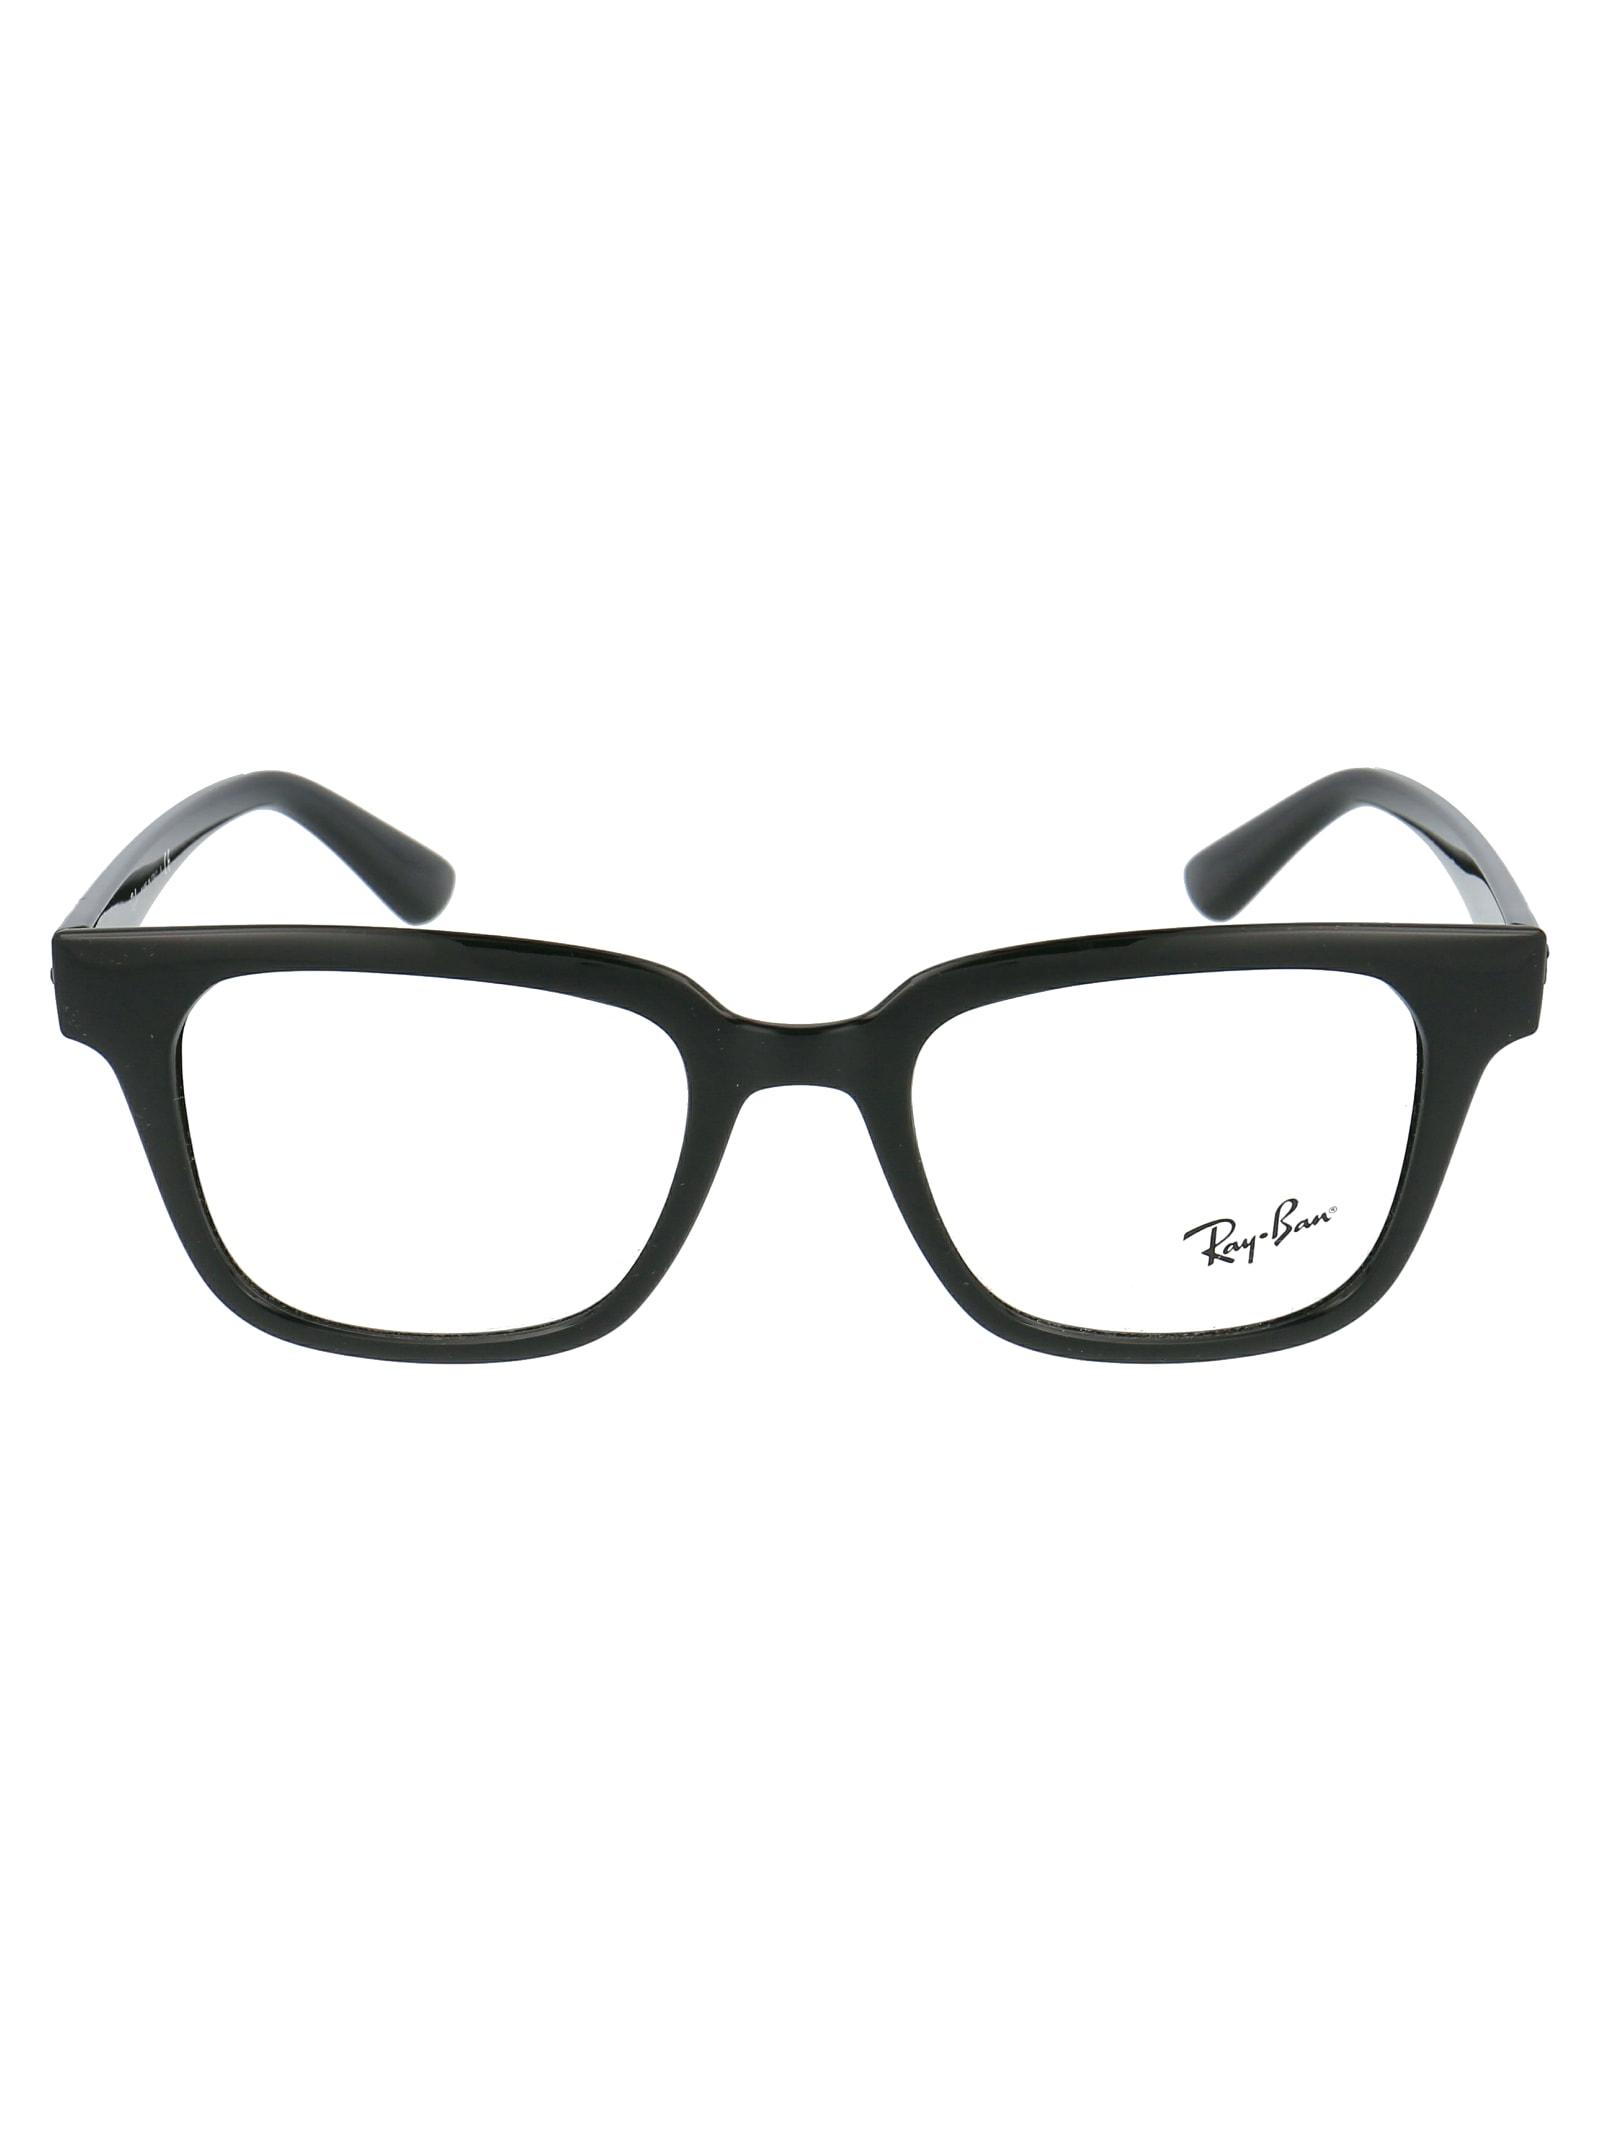 Ray Ban Eyewear In Black